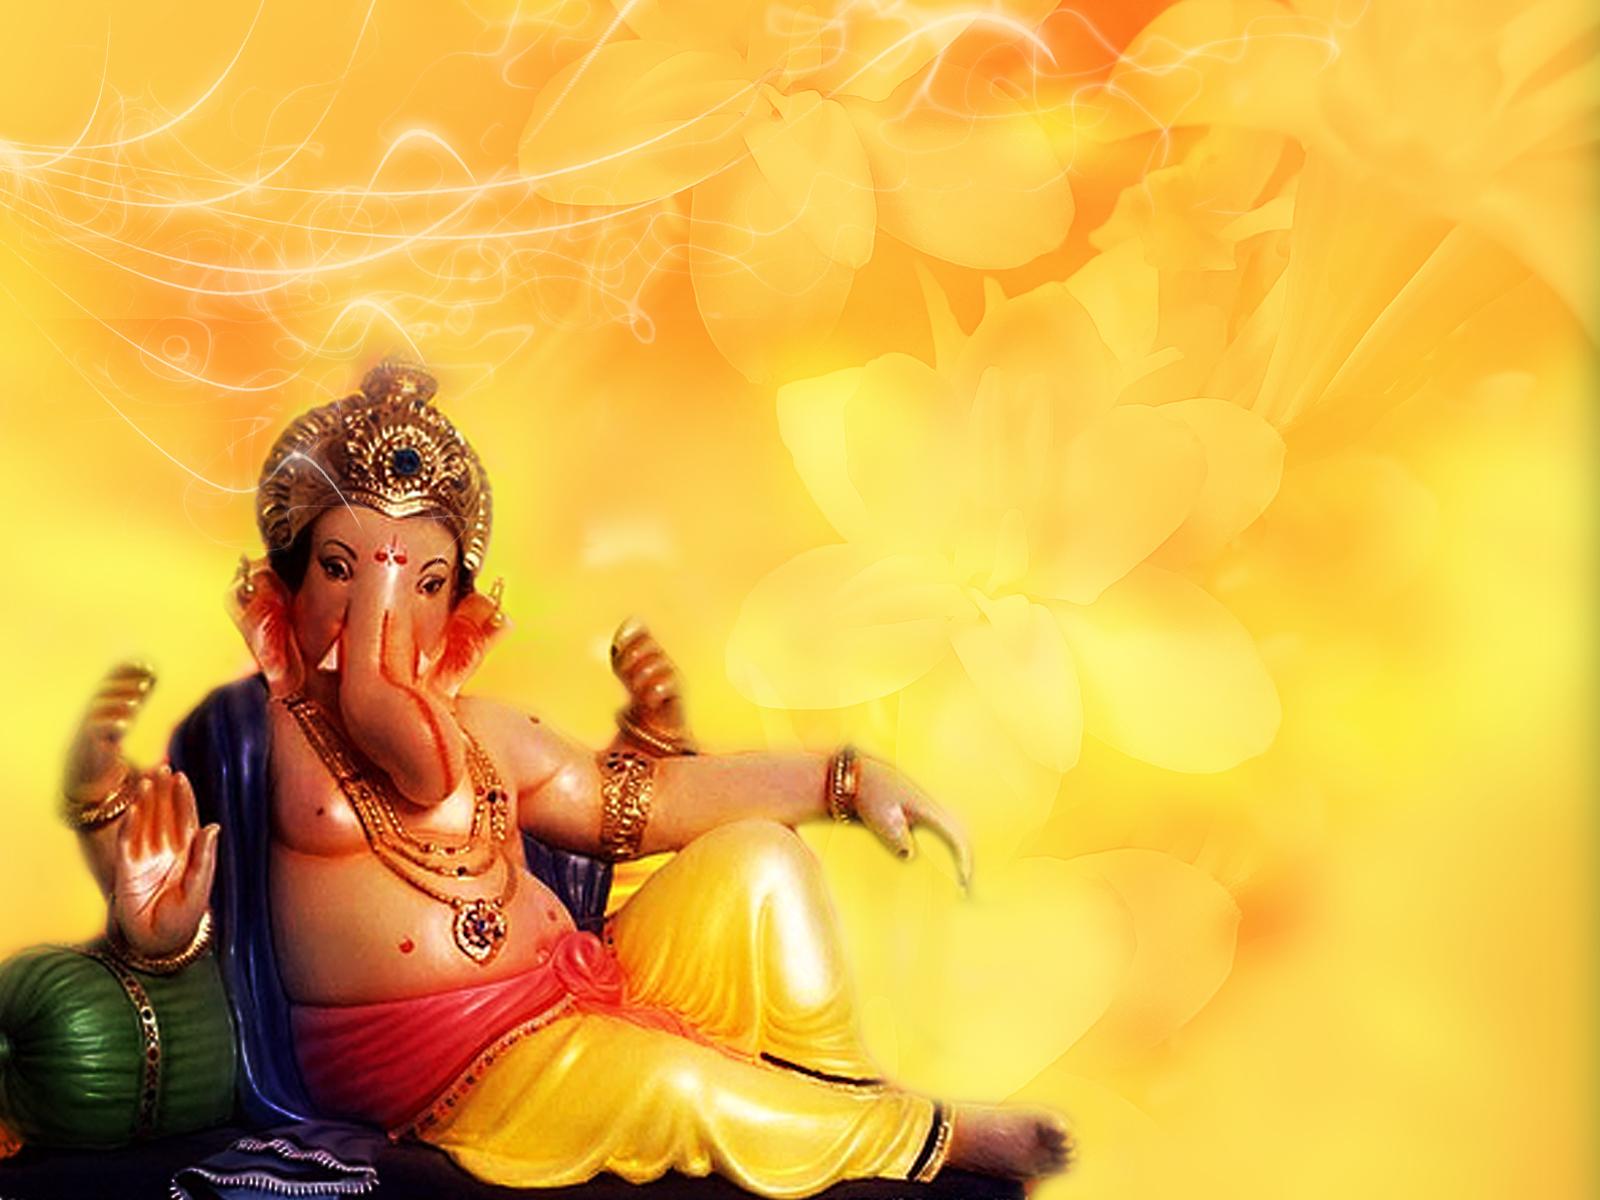 Ganesh-Chaturthi-Wallpapers-Images-Photos-2014-1